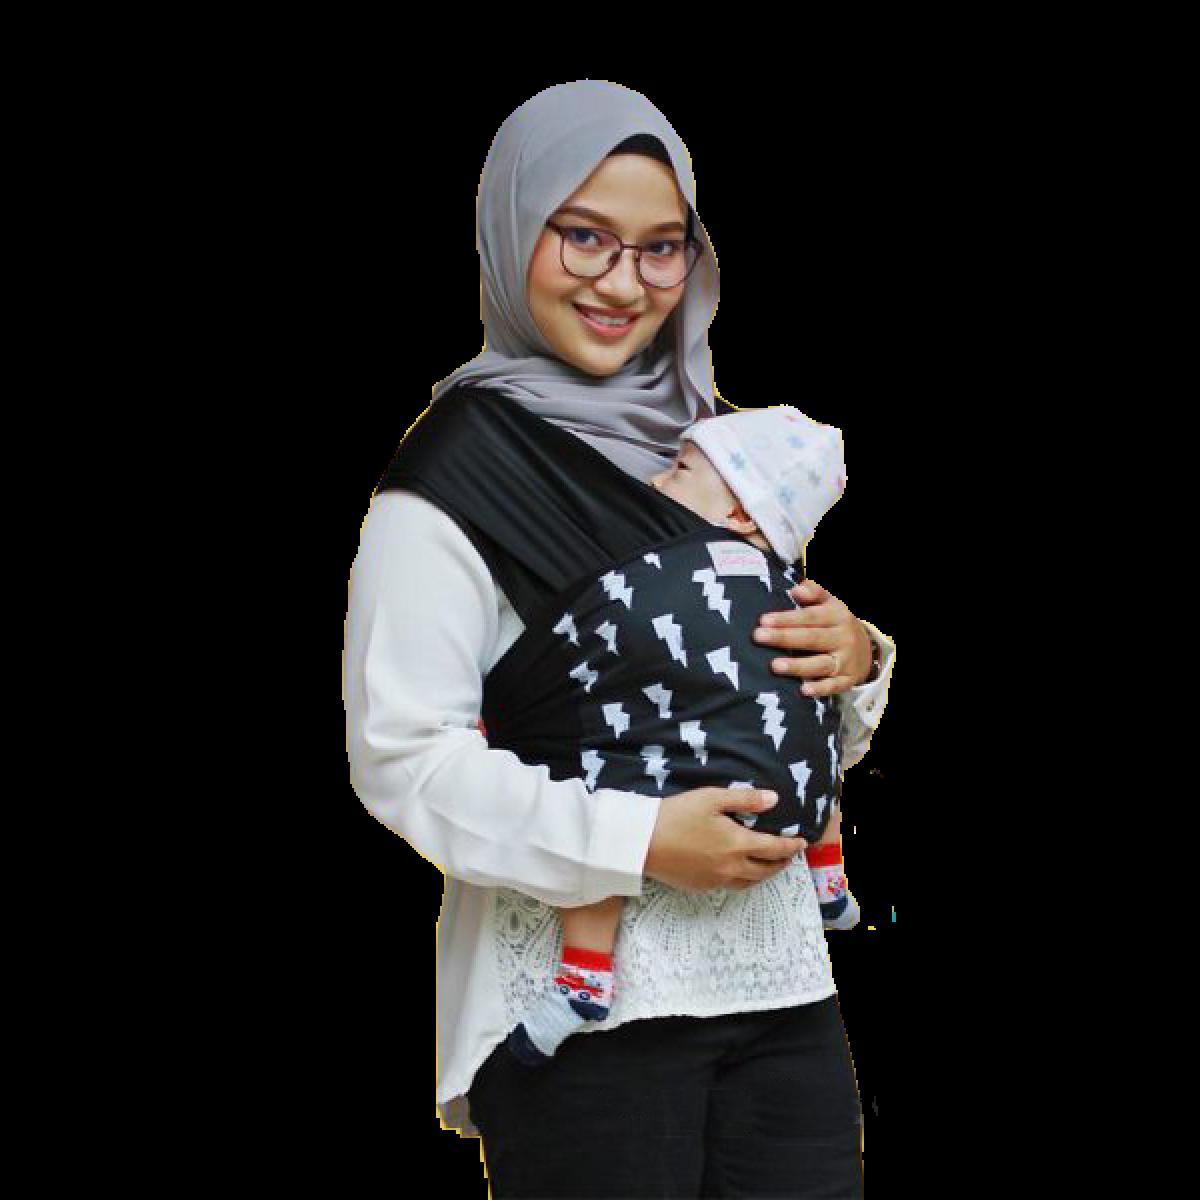 Instant Baby Wrap Mak Yang - Kico Baby Center